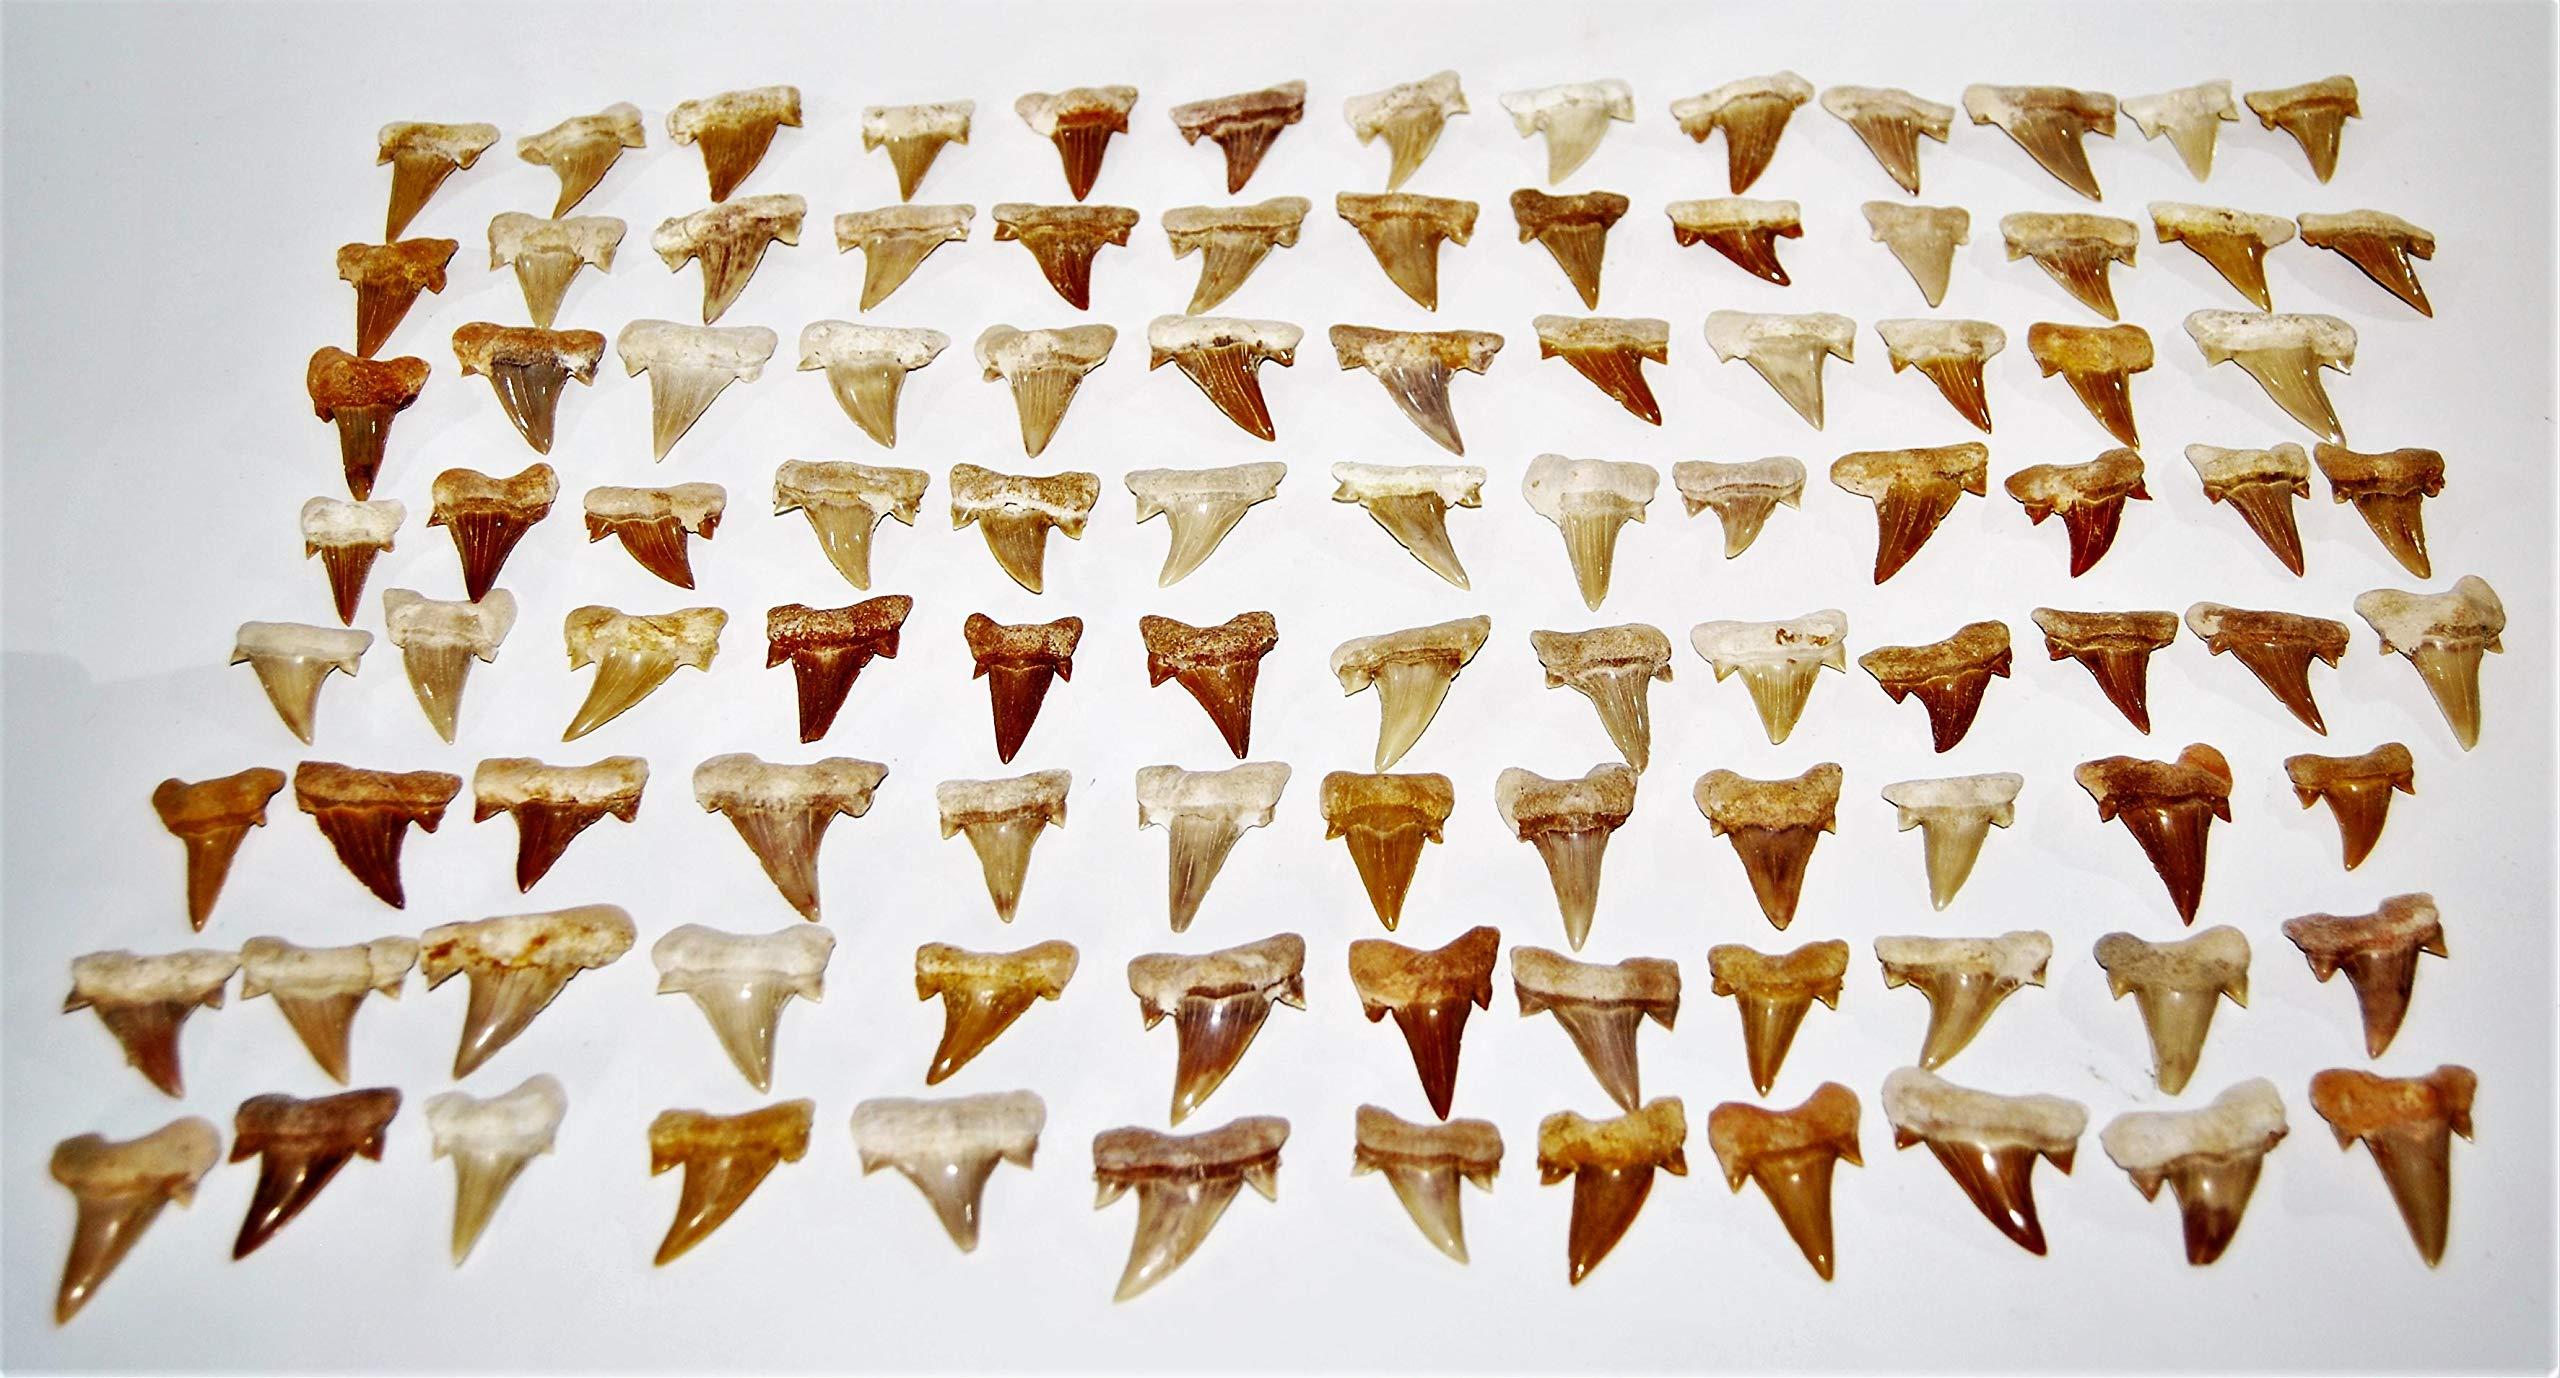 OTODUS Shark Tooth Real Fossils ¾-1 Inch (S) Lot of 100 Teeth B Grade 14512